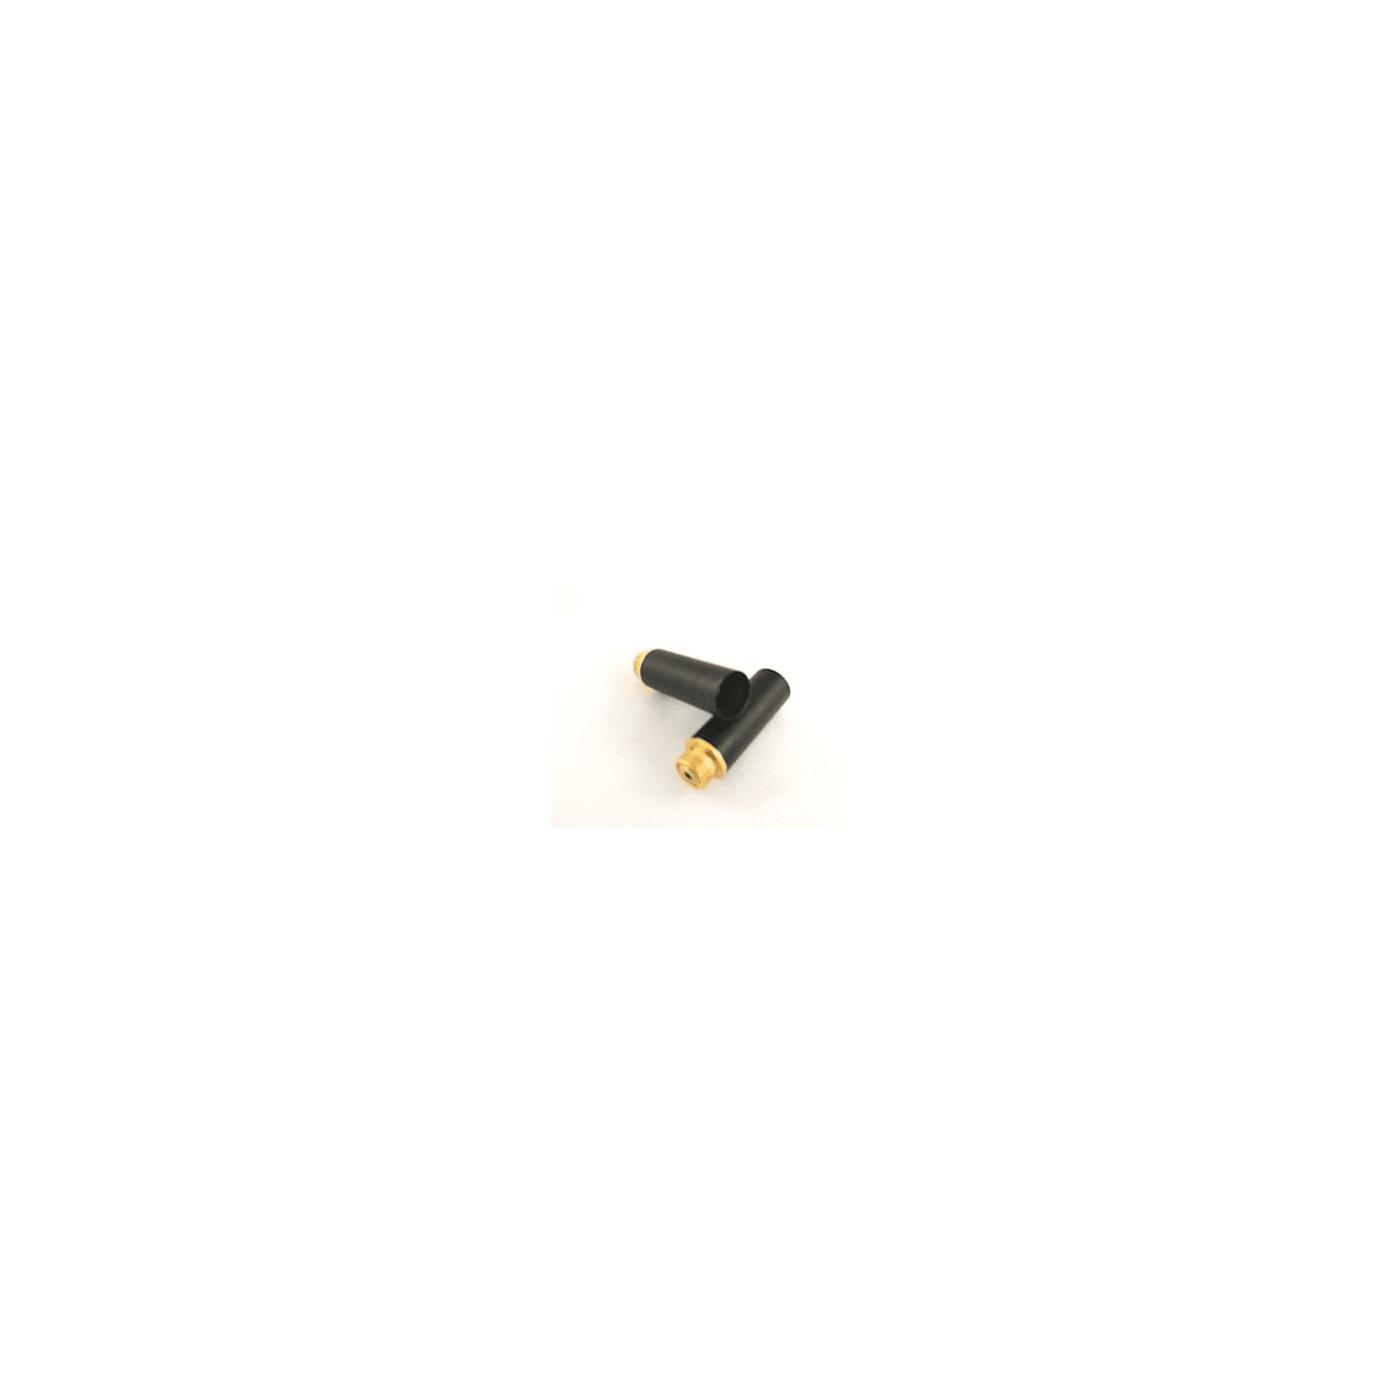 Boge 510 Atomizer - Black